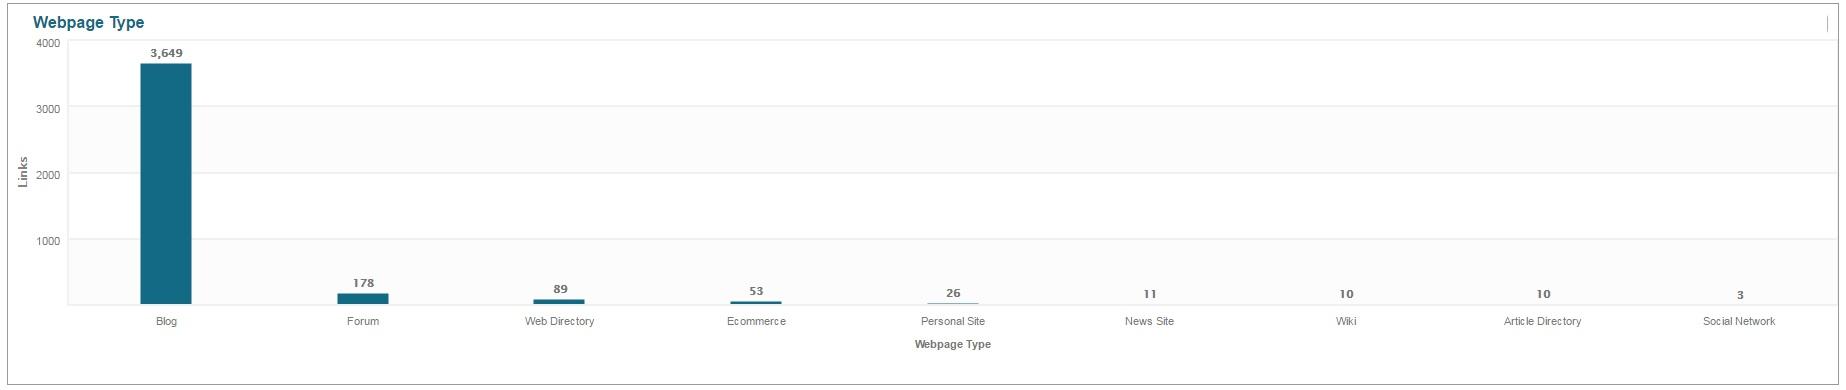 webpagetype